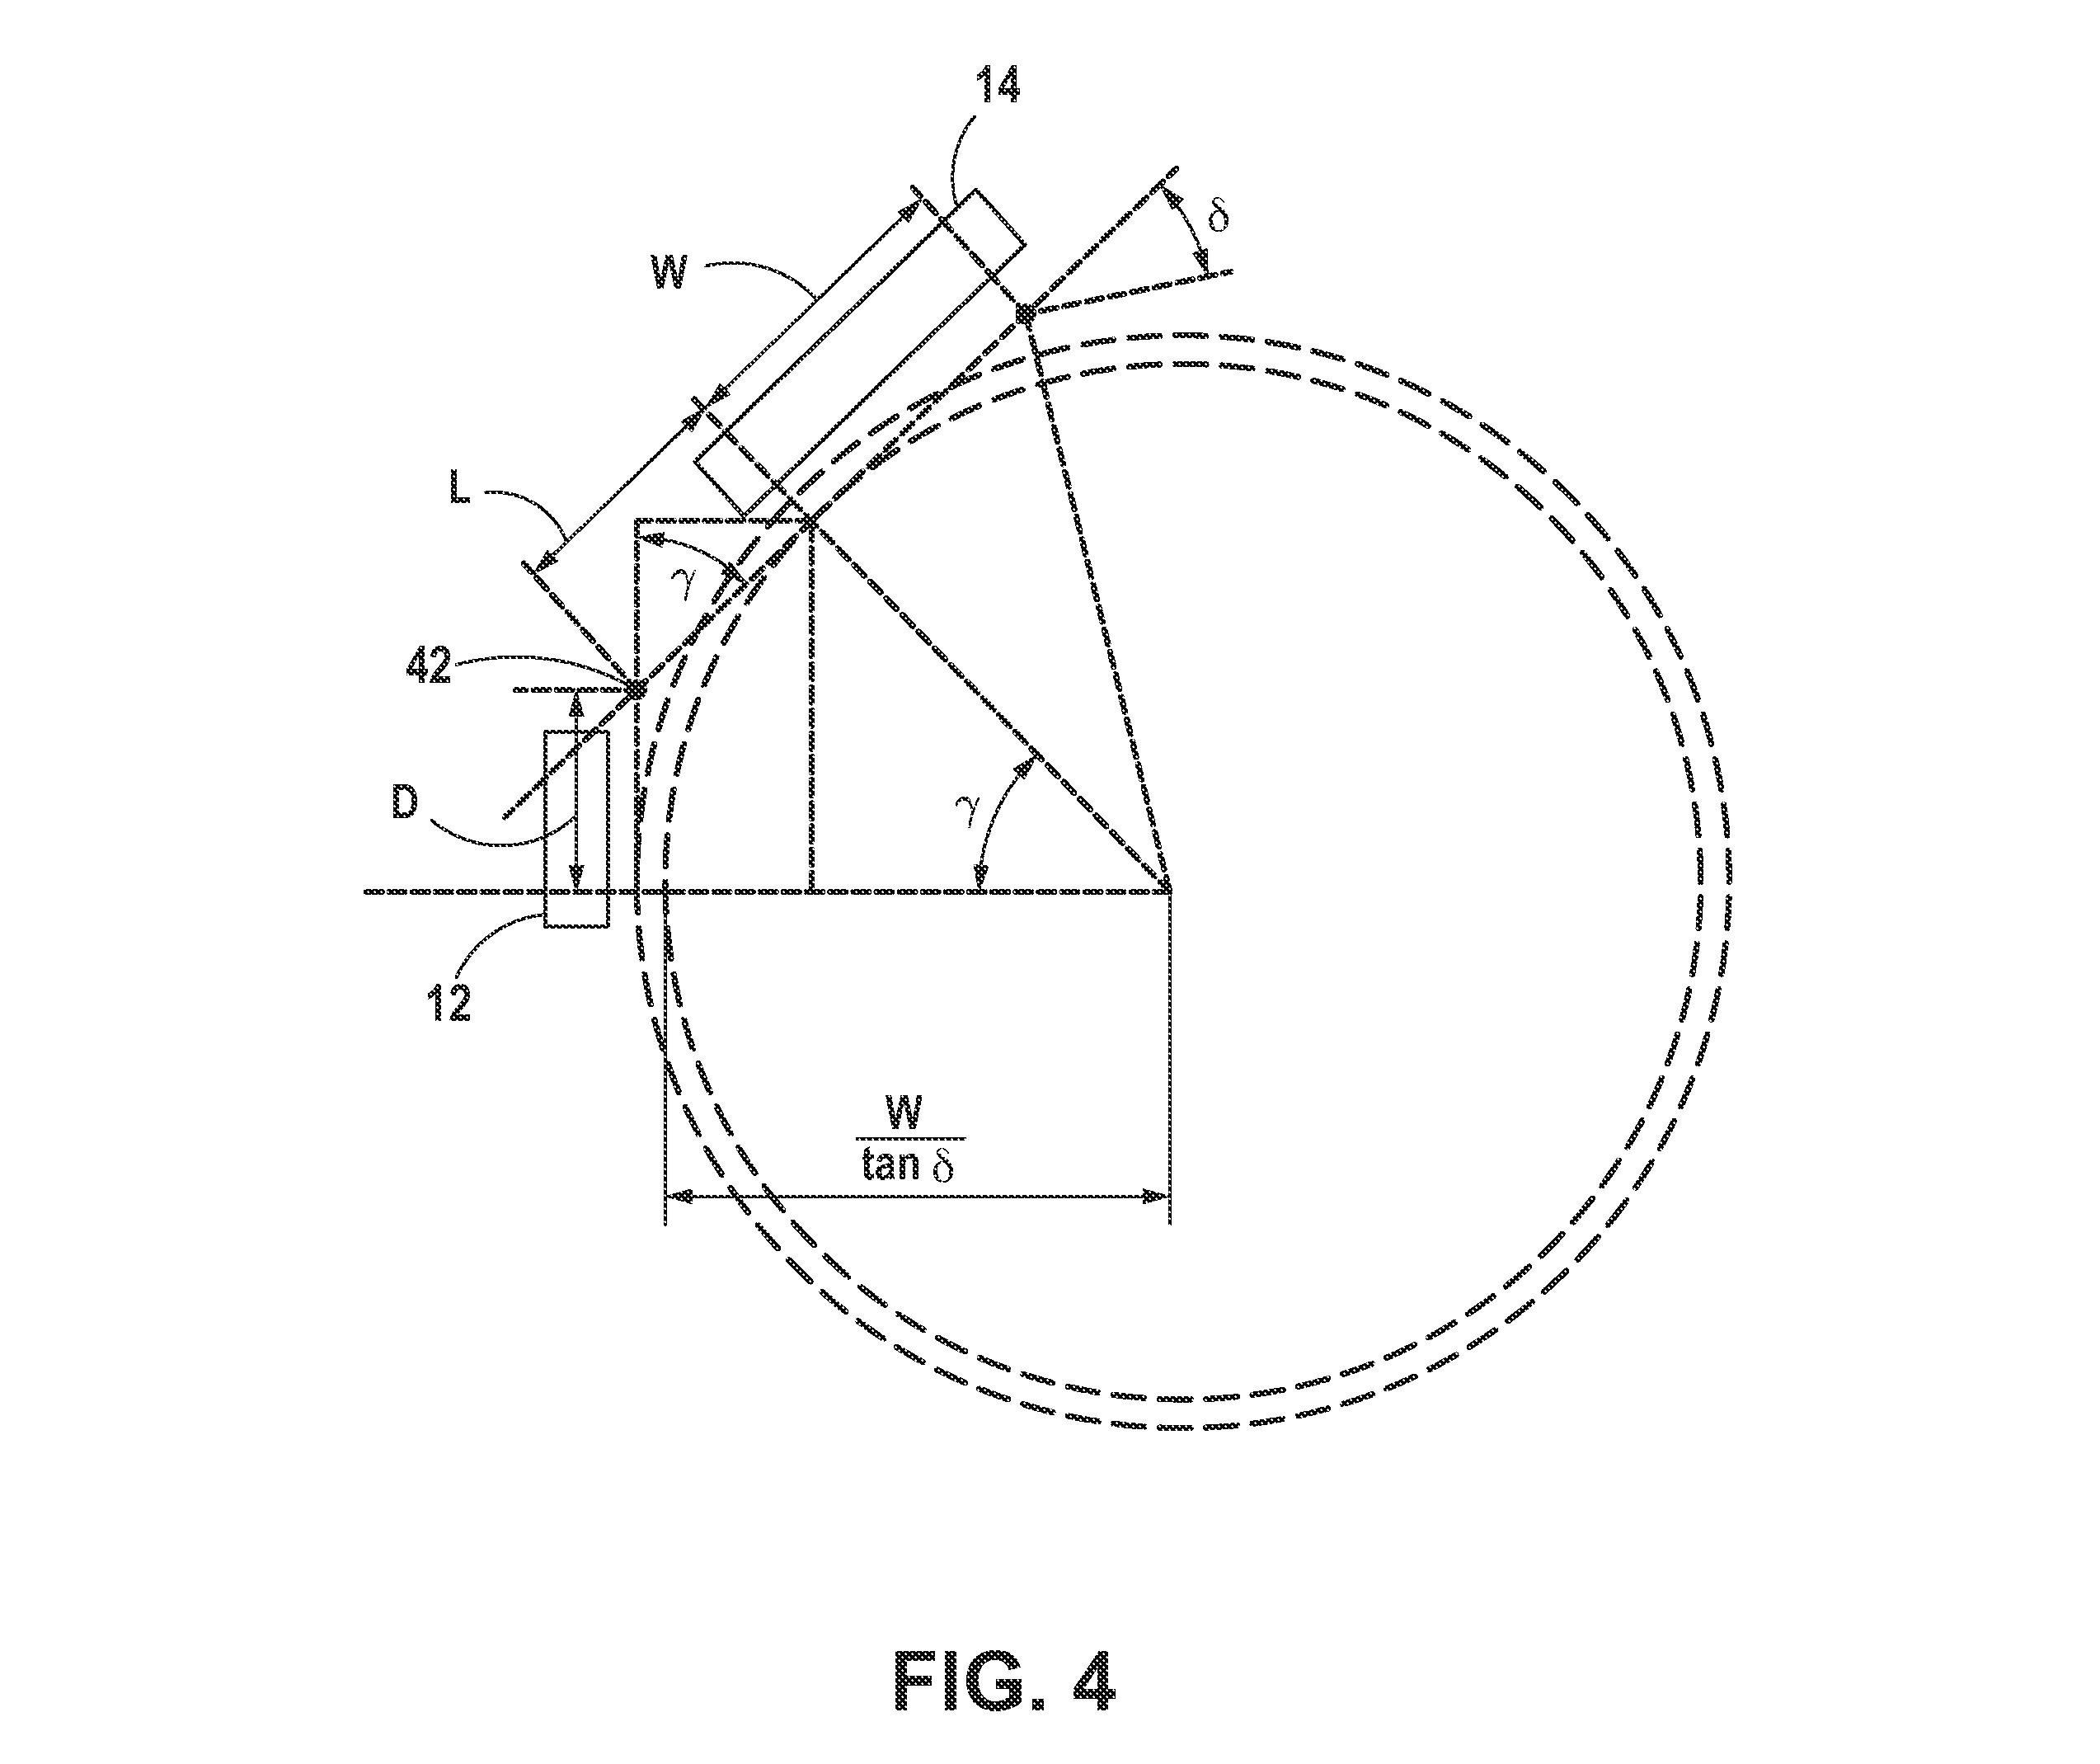 patent us 9 926 008 b2 Dump Trailer Wiring Schematic patent